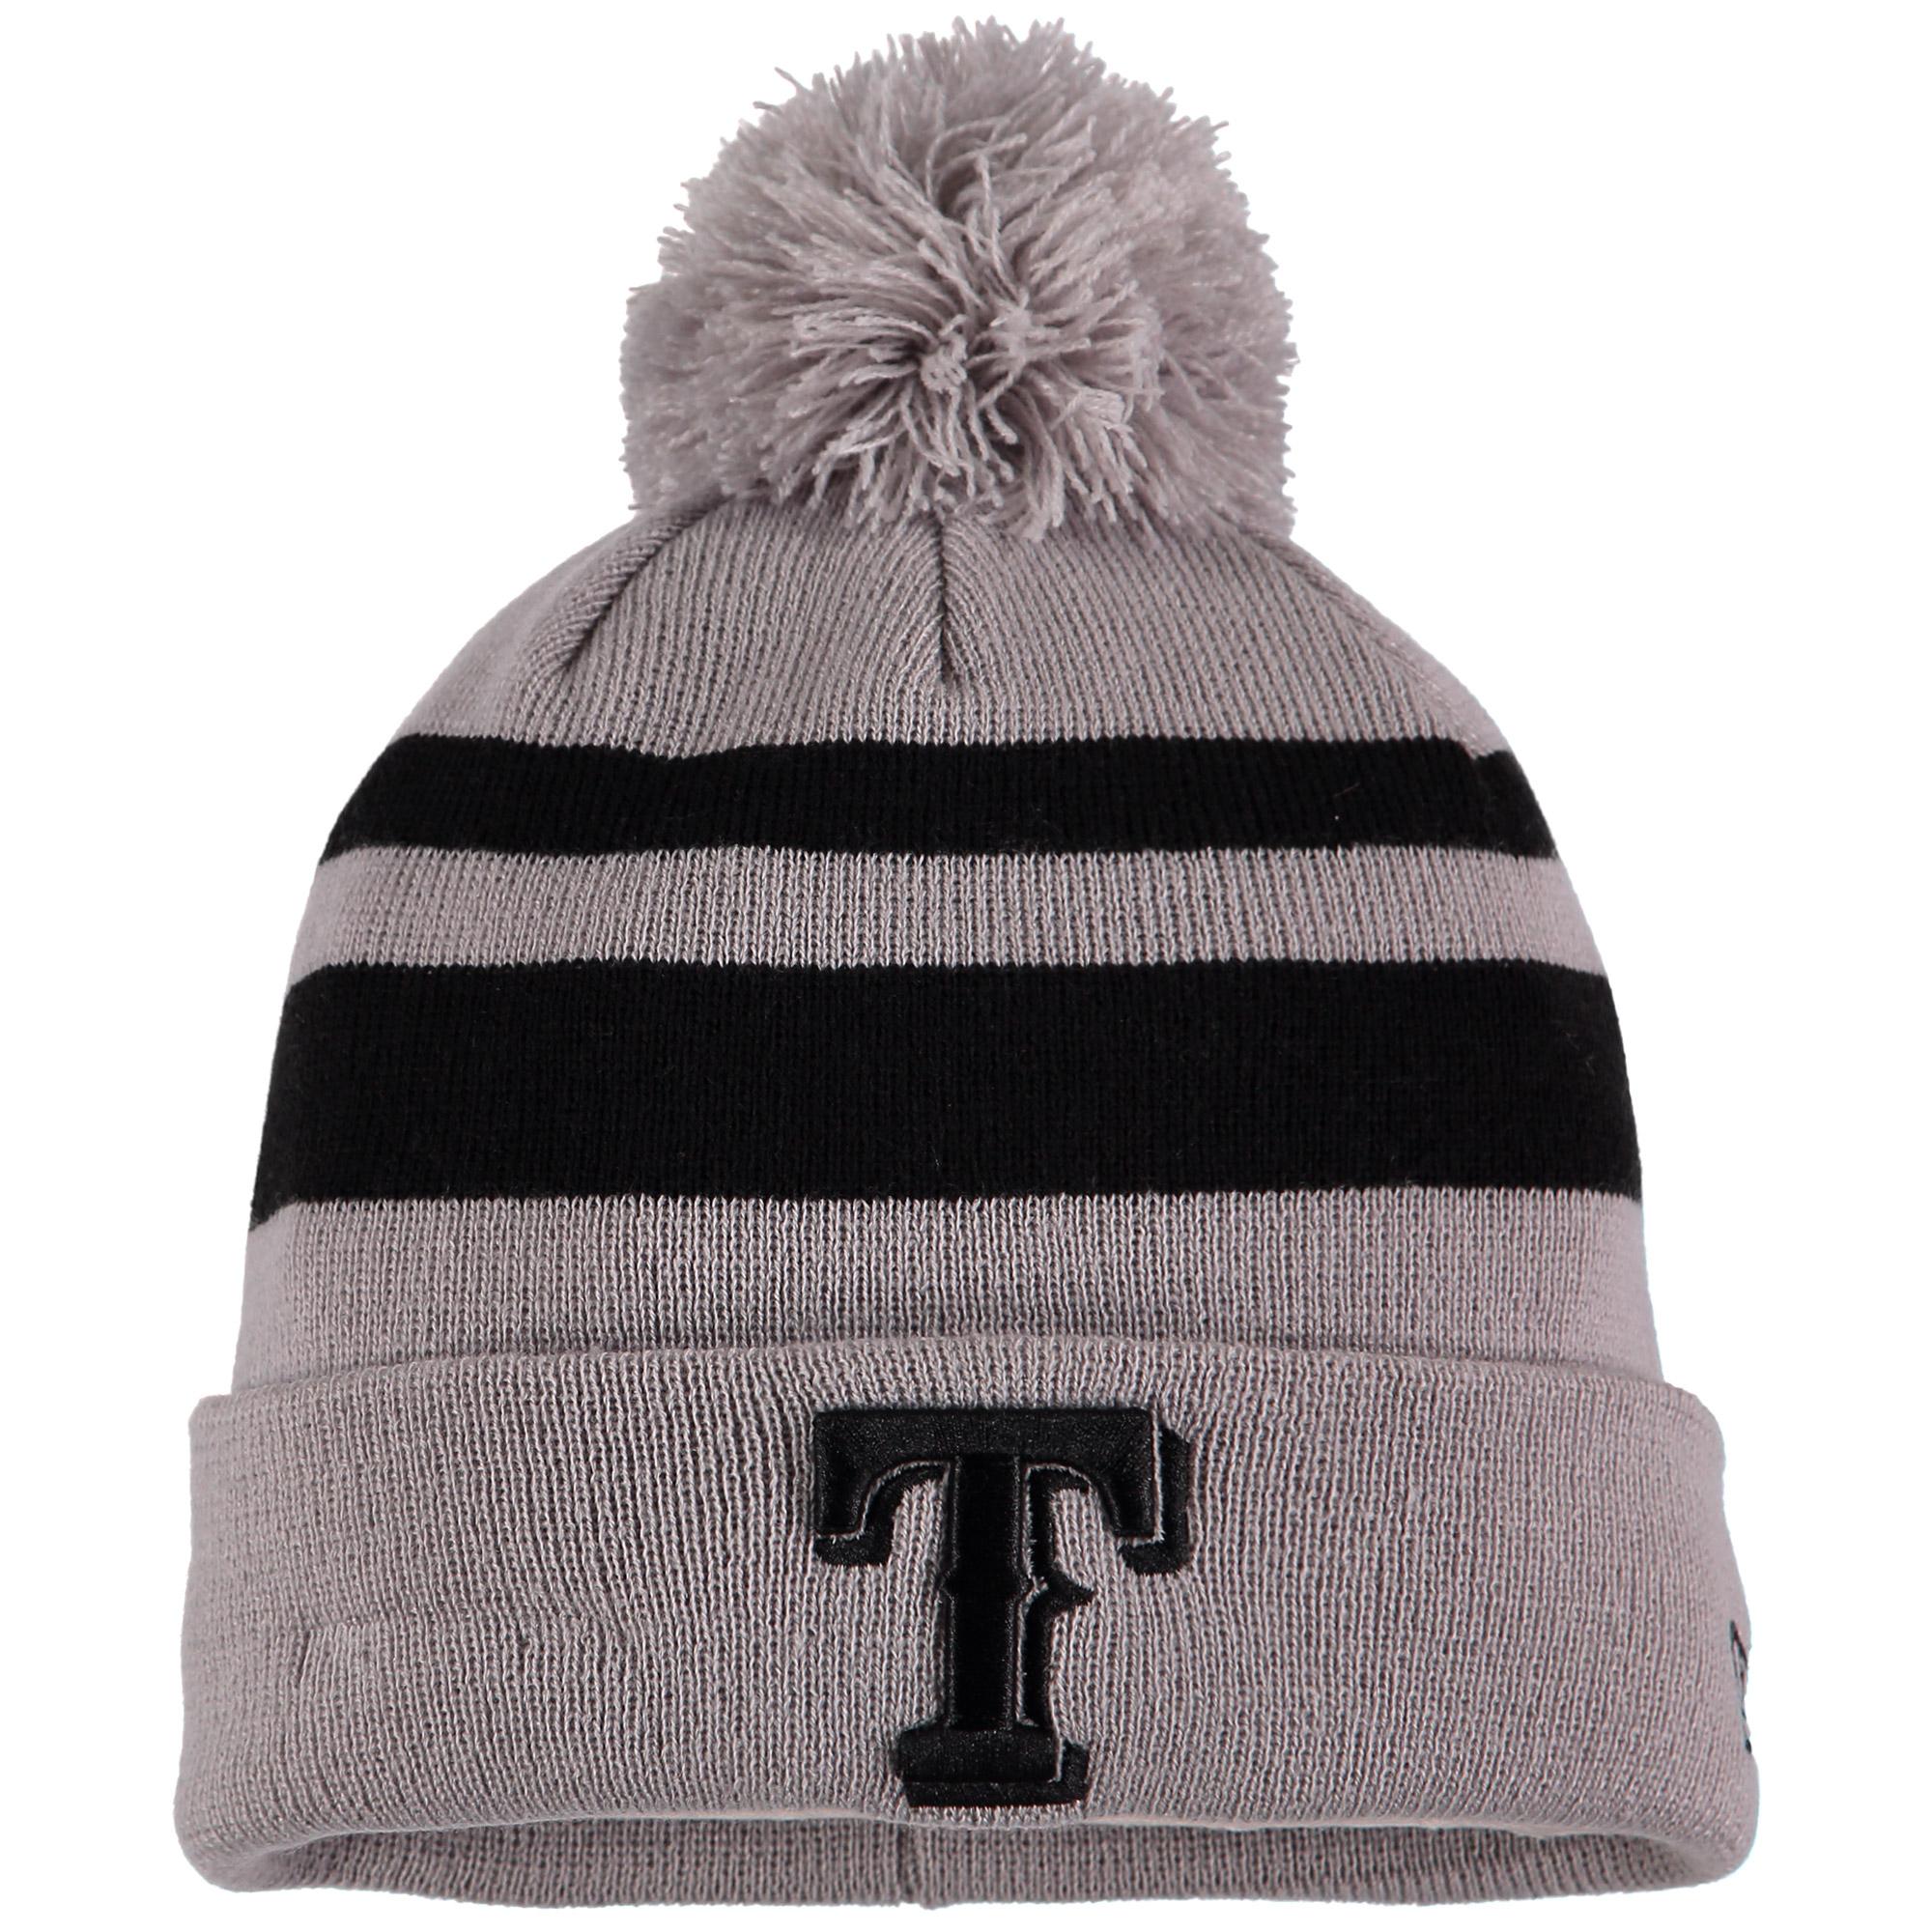 Texas Rangers New Era Rebound Cuffed Knit Hat with Pom - Gray/Black - OSFA